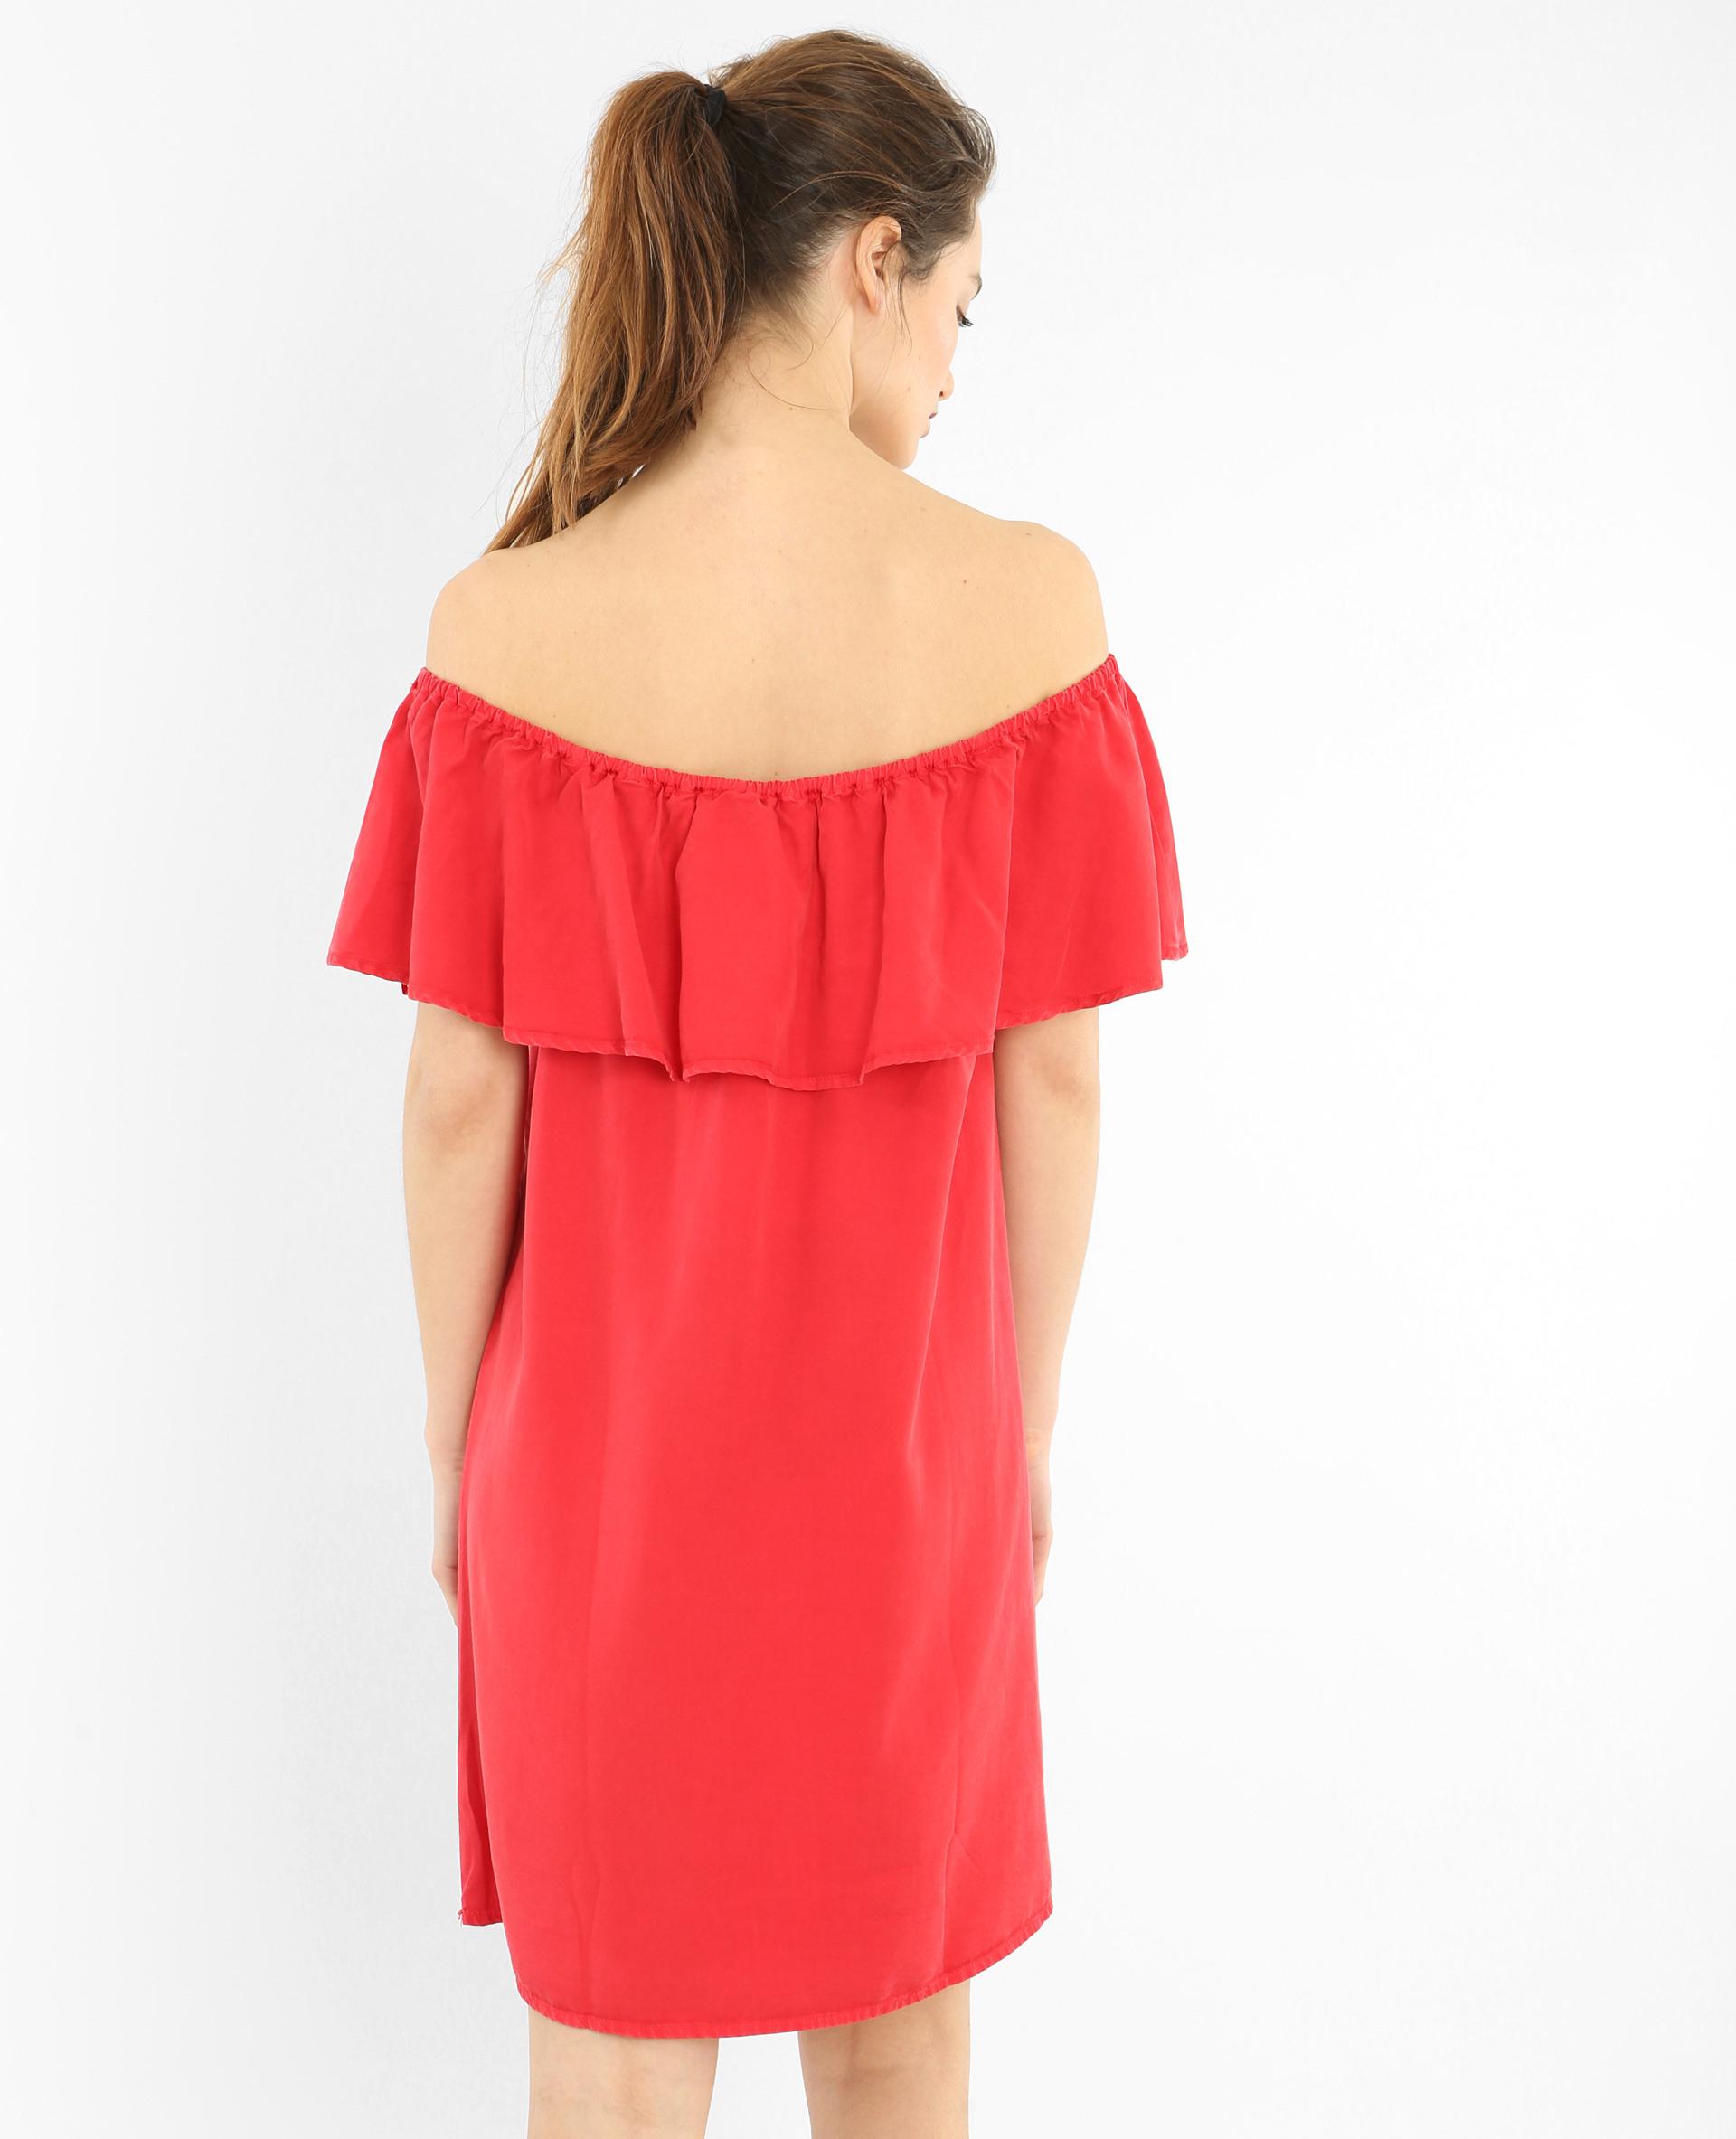 Bardotrüschenkleid Rot  780579342A03  Pimkie